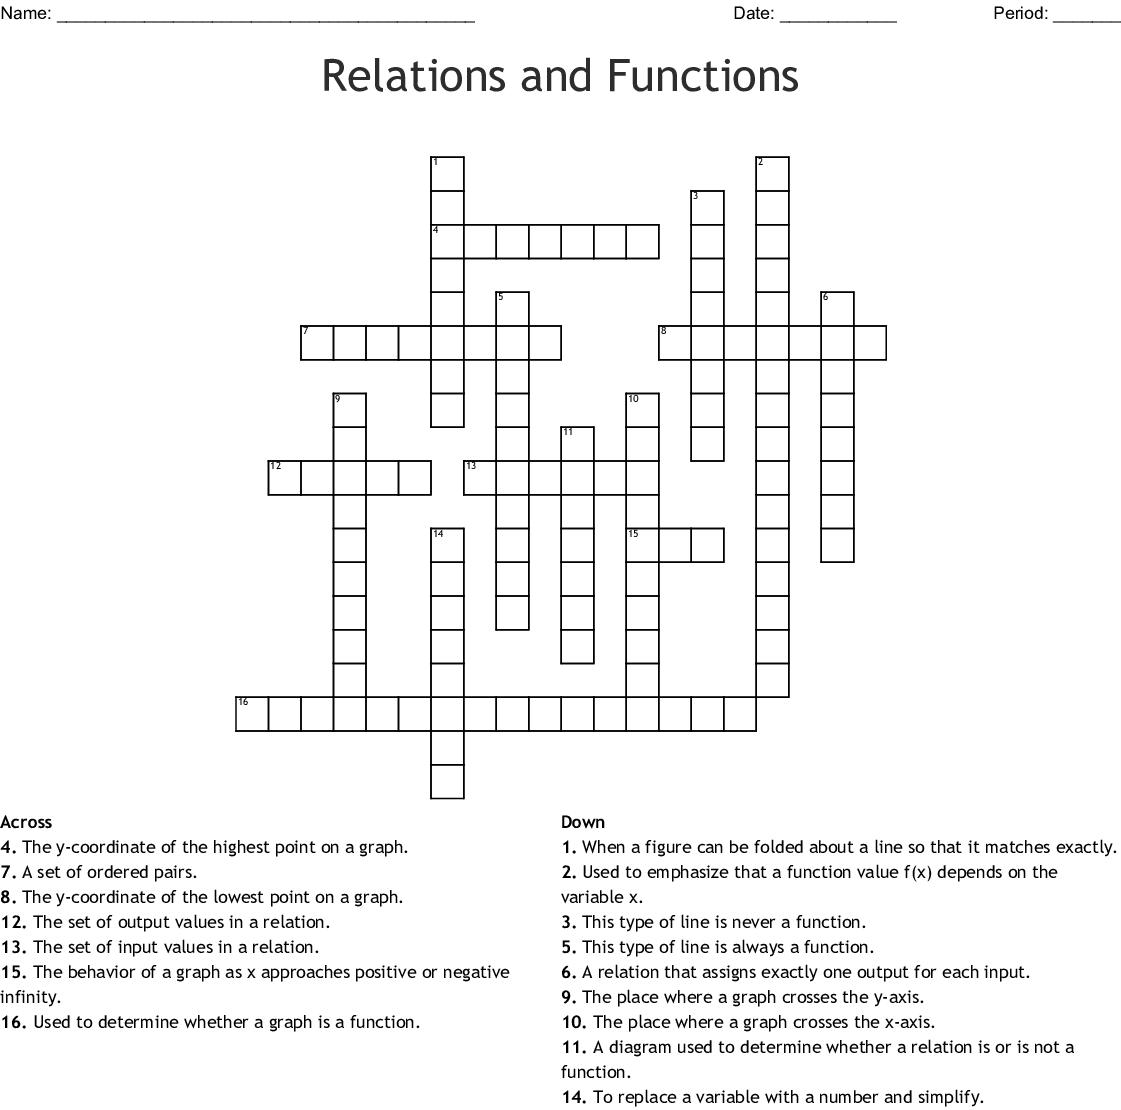 Relations and Functions Crossword - WordMint